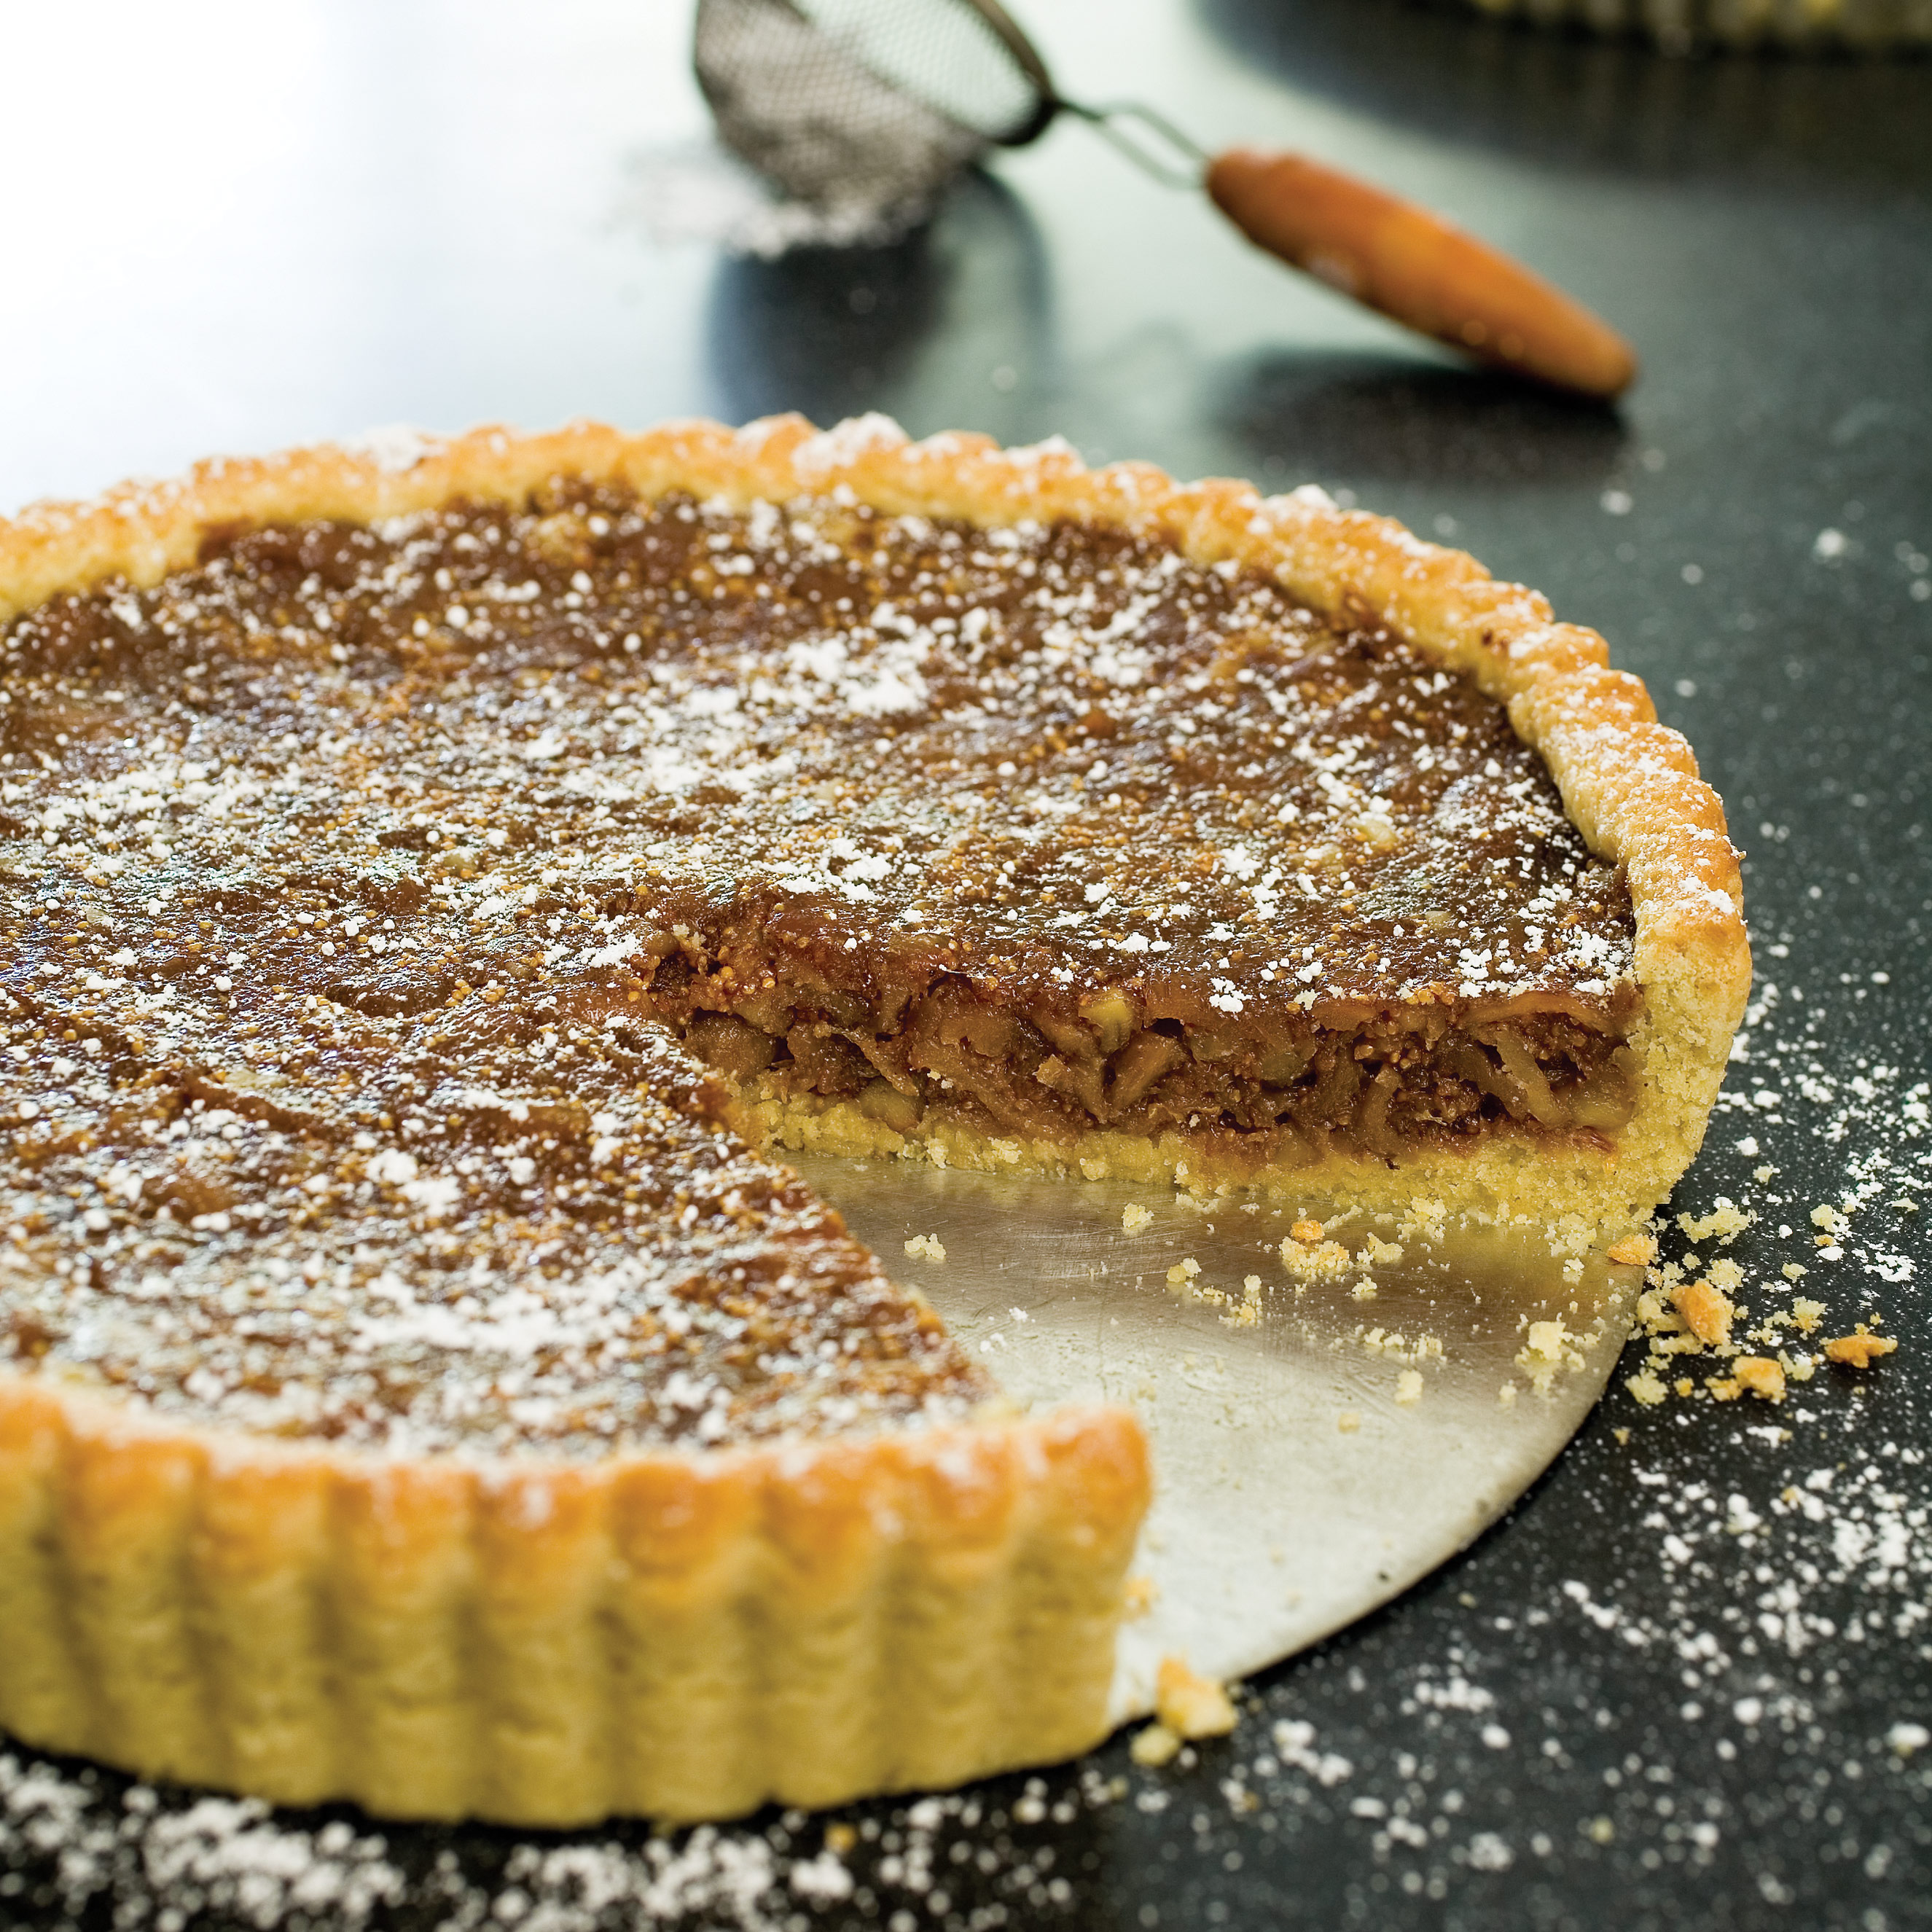 FigWalnut Tart Recipe  Cooks Illustrated